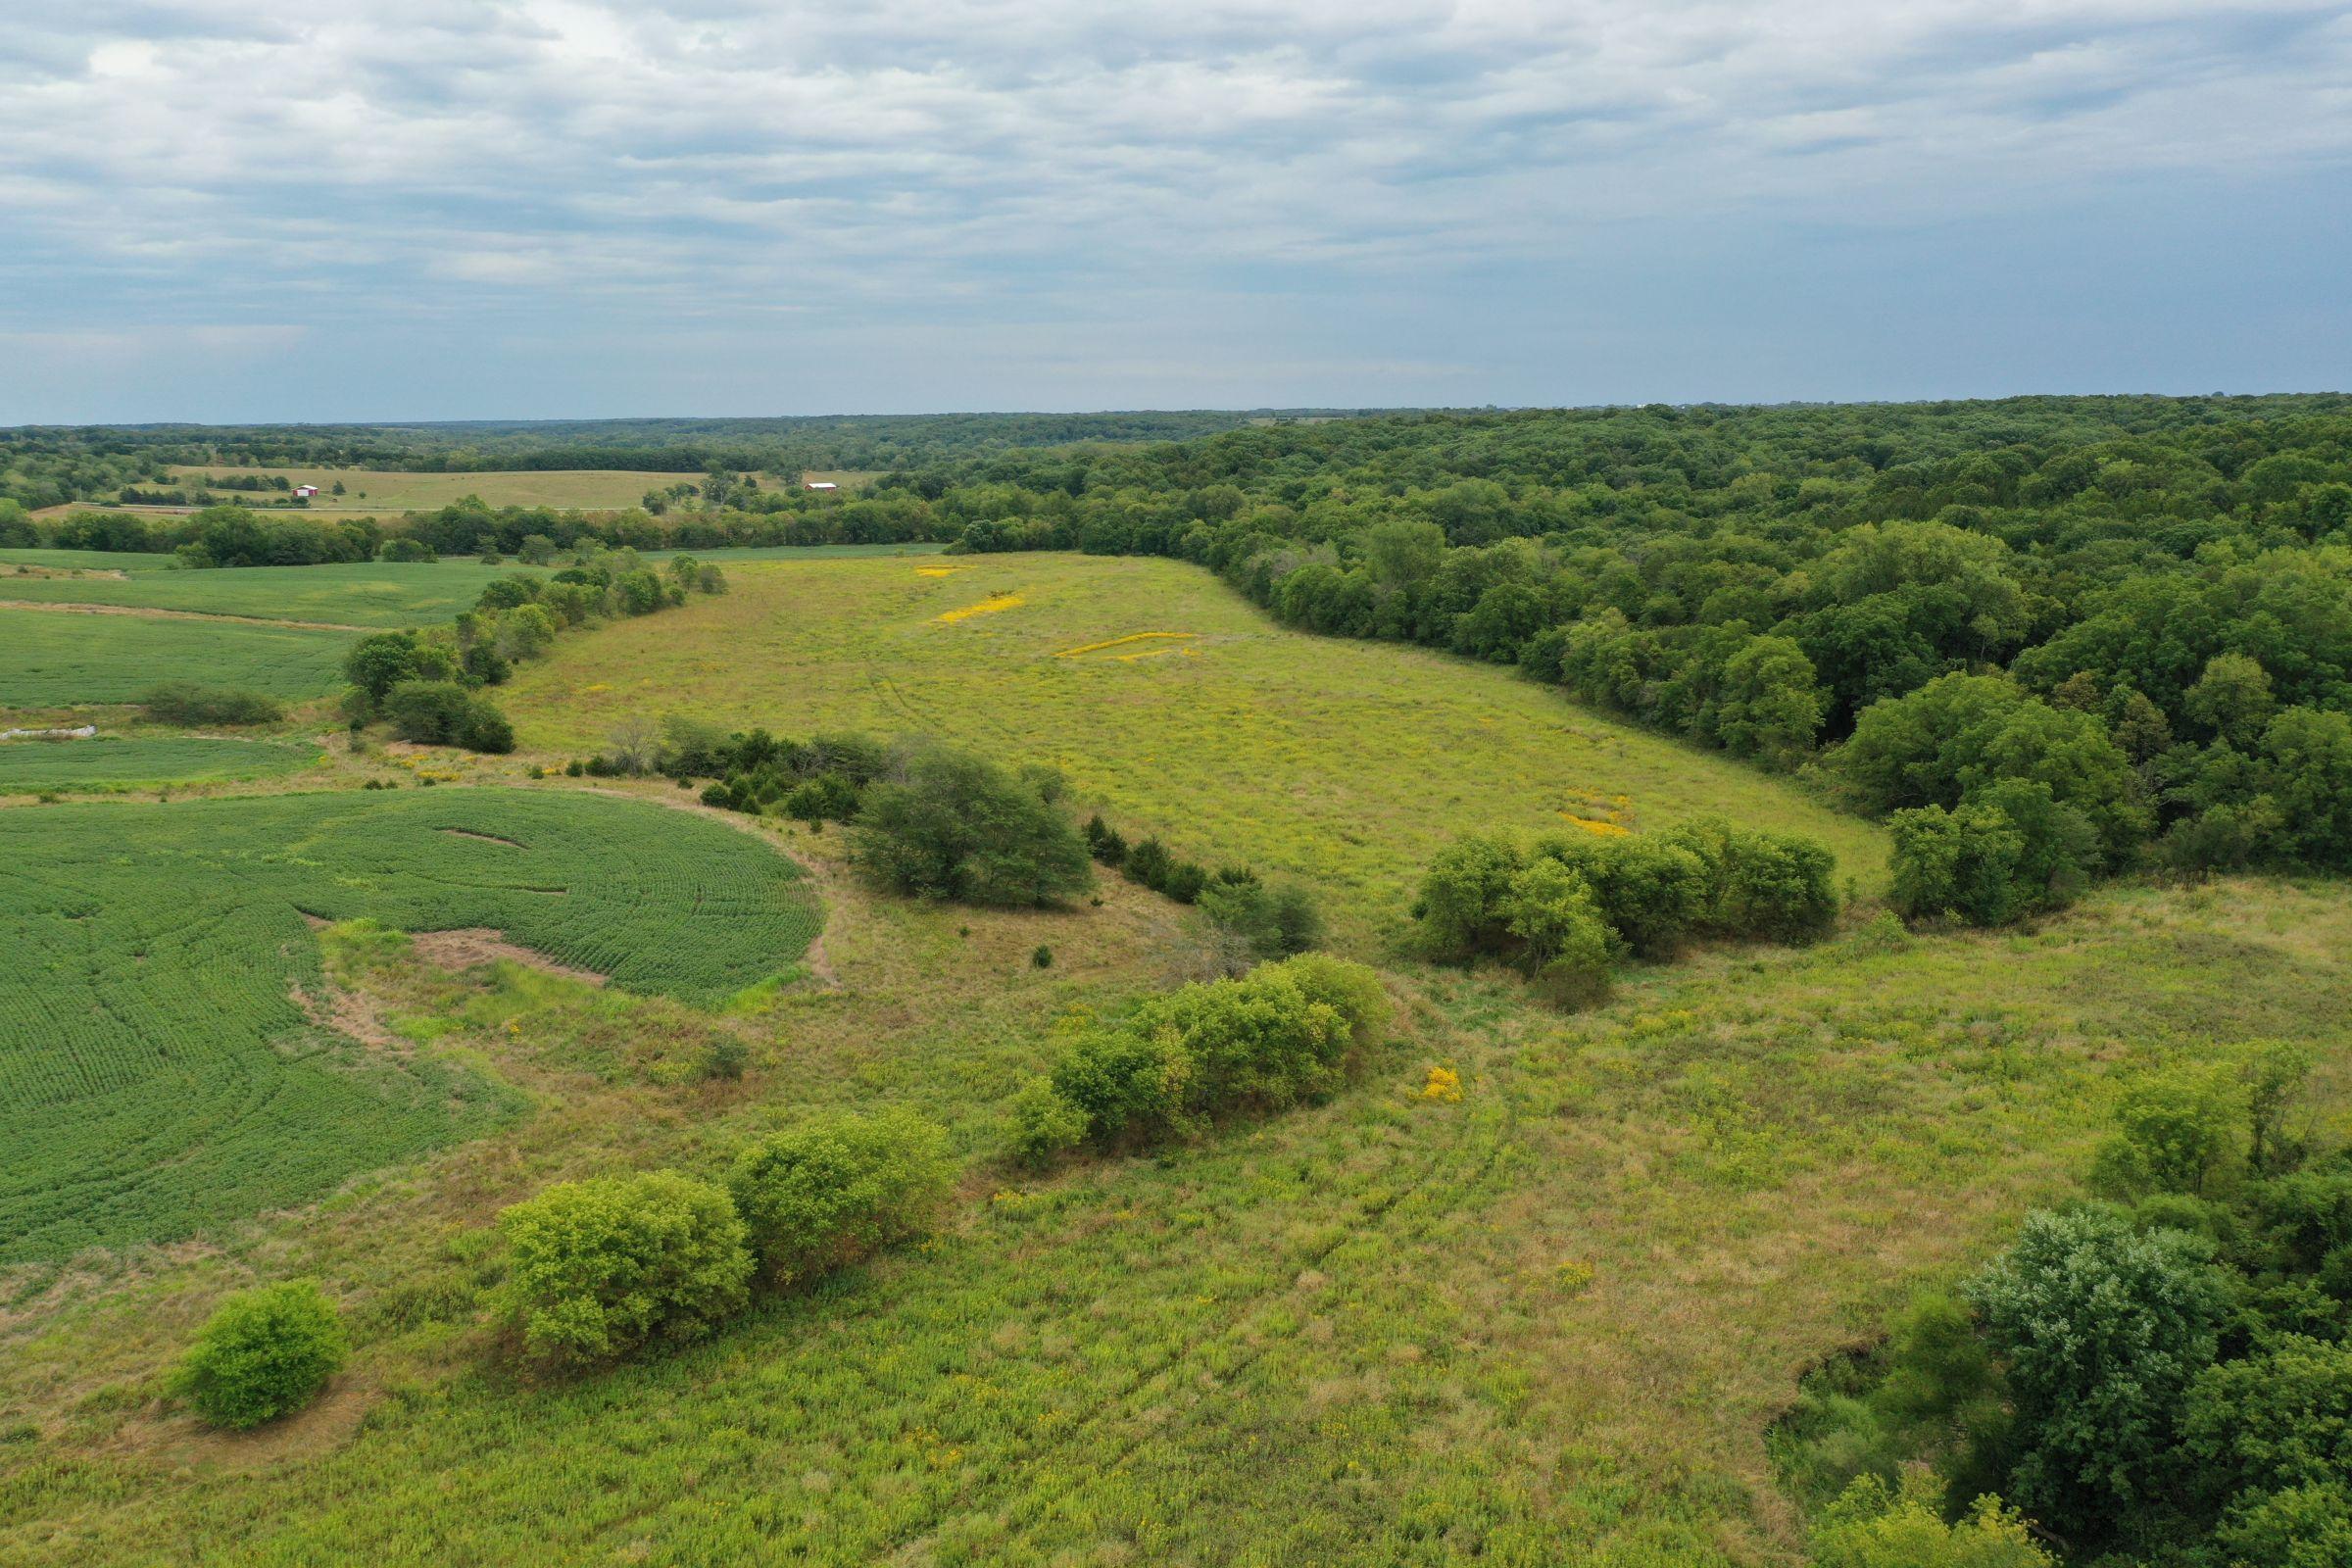 land-clarke-county-iowa-86-acres-listing-number-15147-1-2020-09-02-143253.jpg